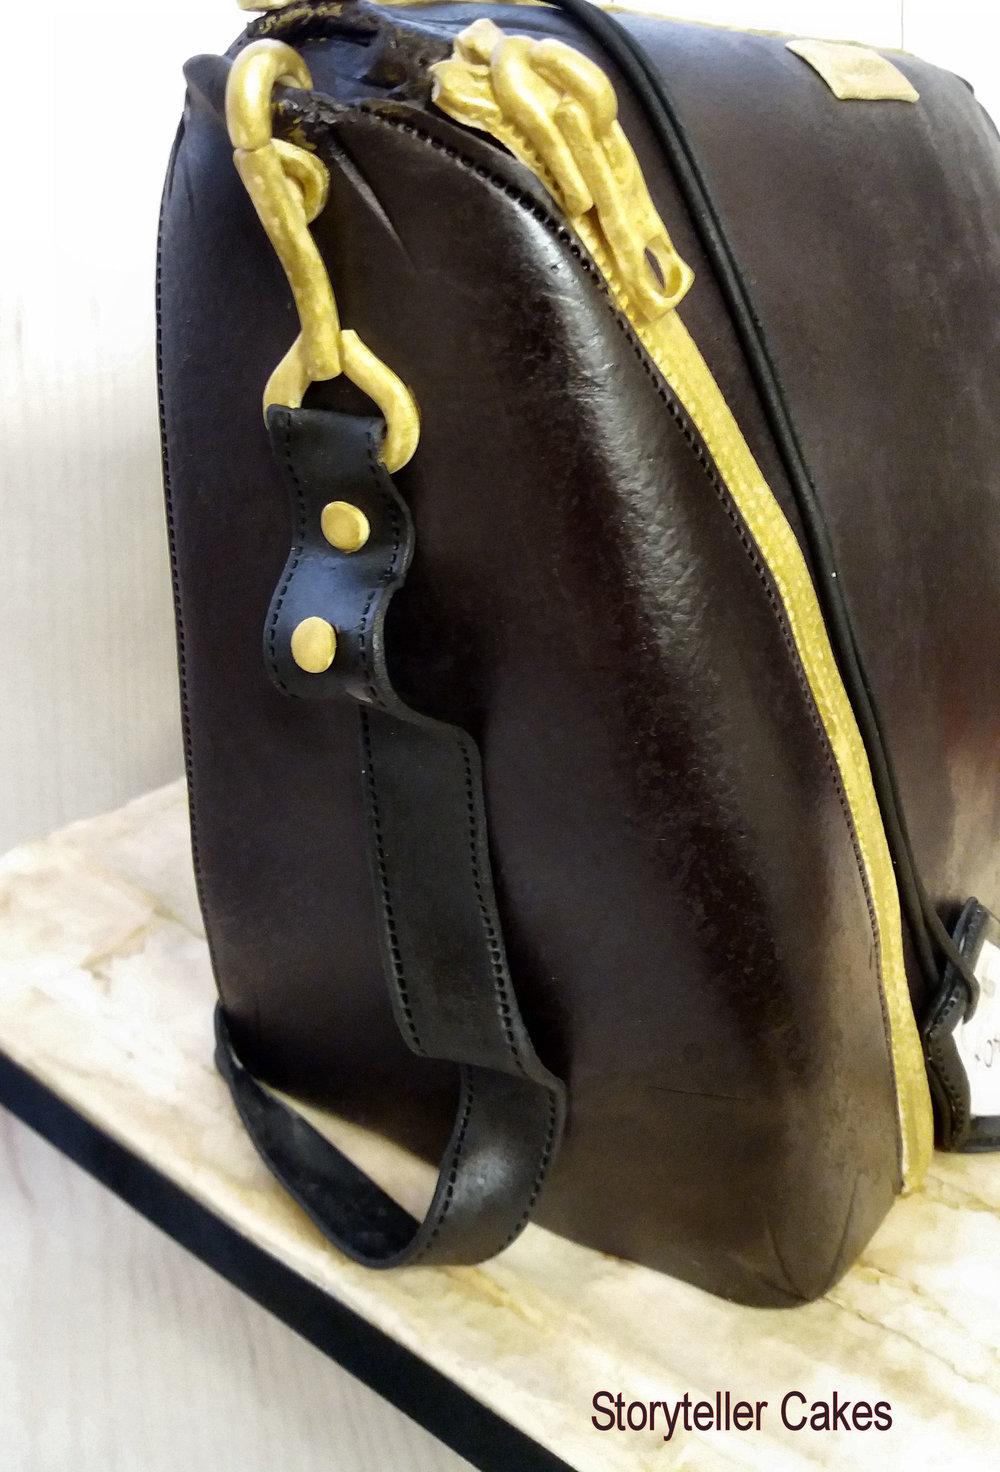 Mulberry Handbag Cake 3.jpg